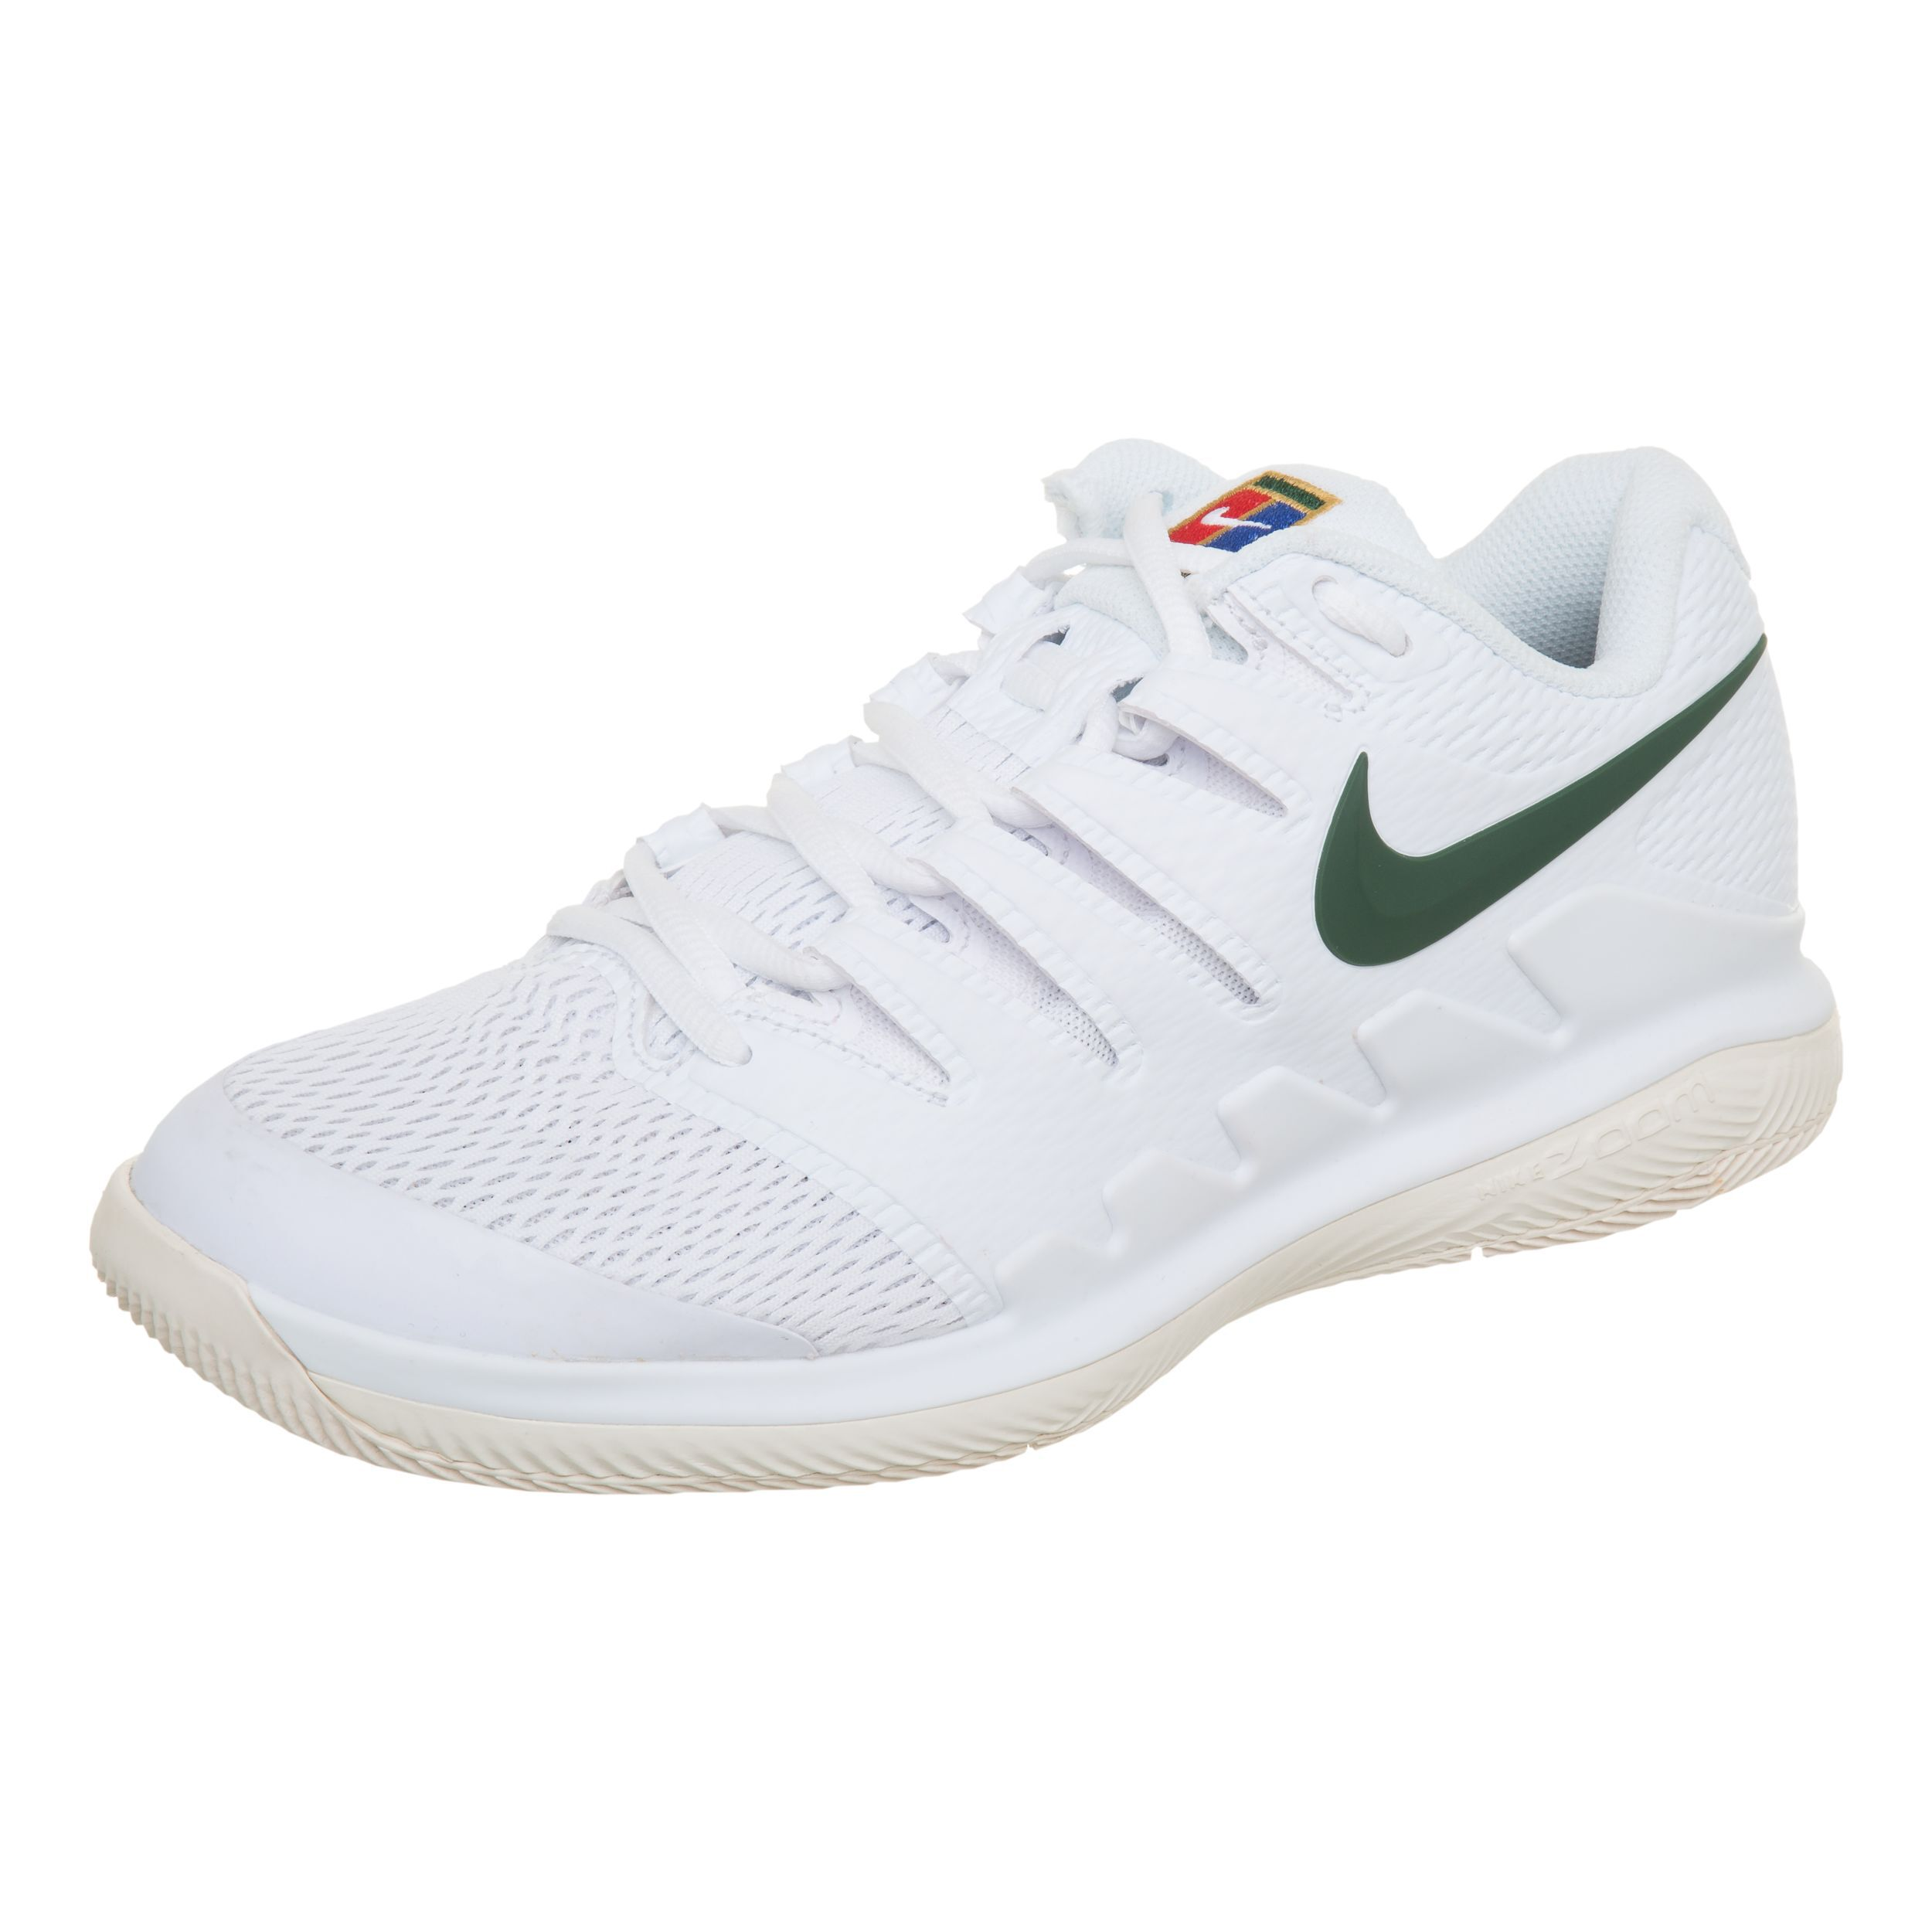 Nike Court Air Zoom Vapor X Online Bestellen Damen